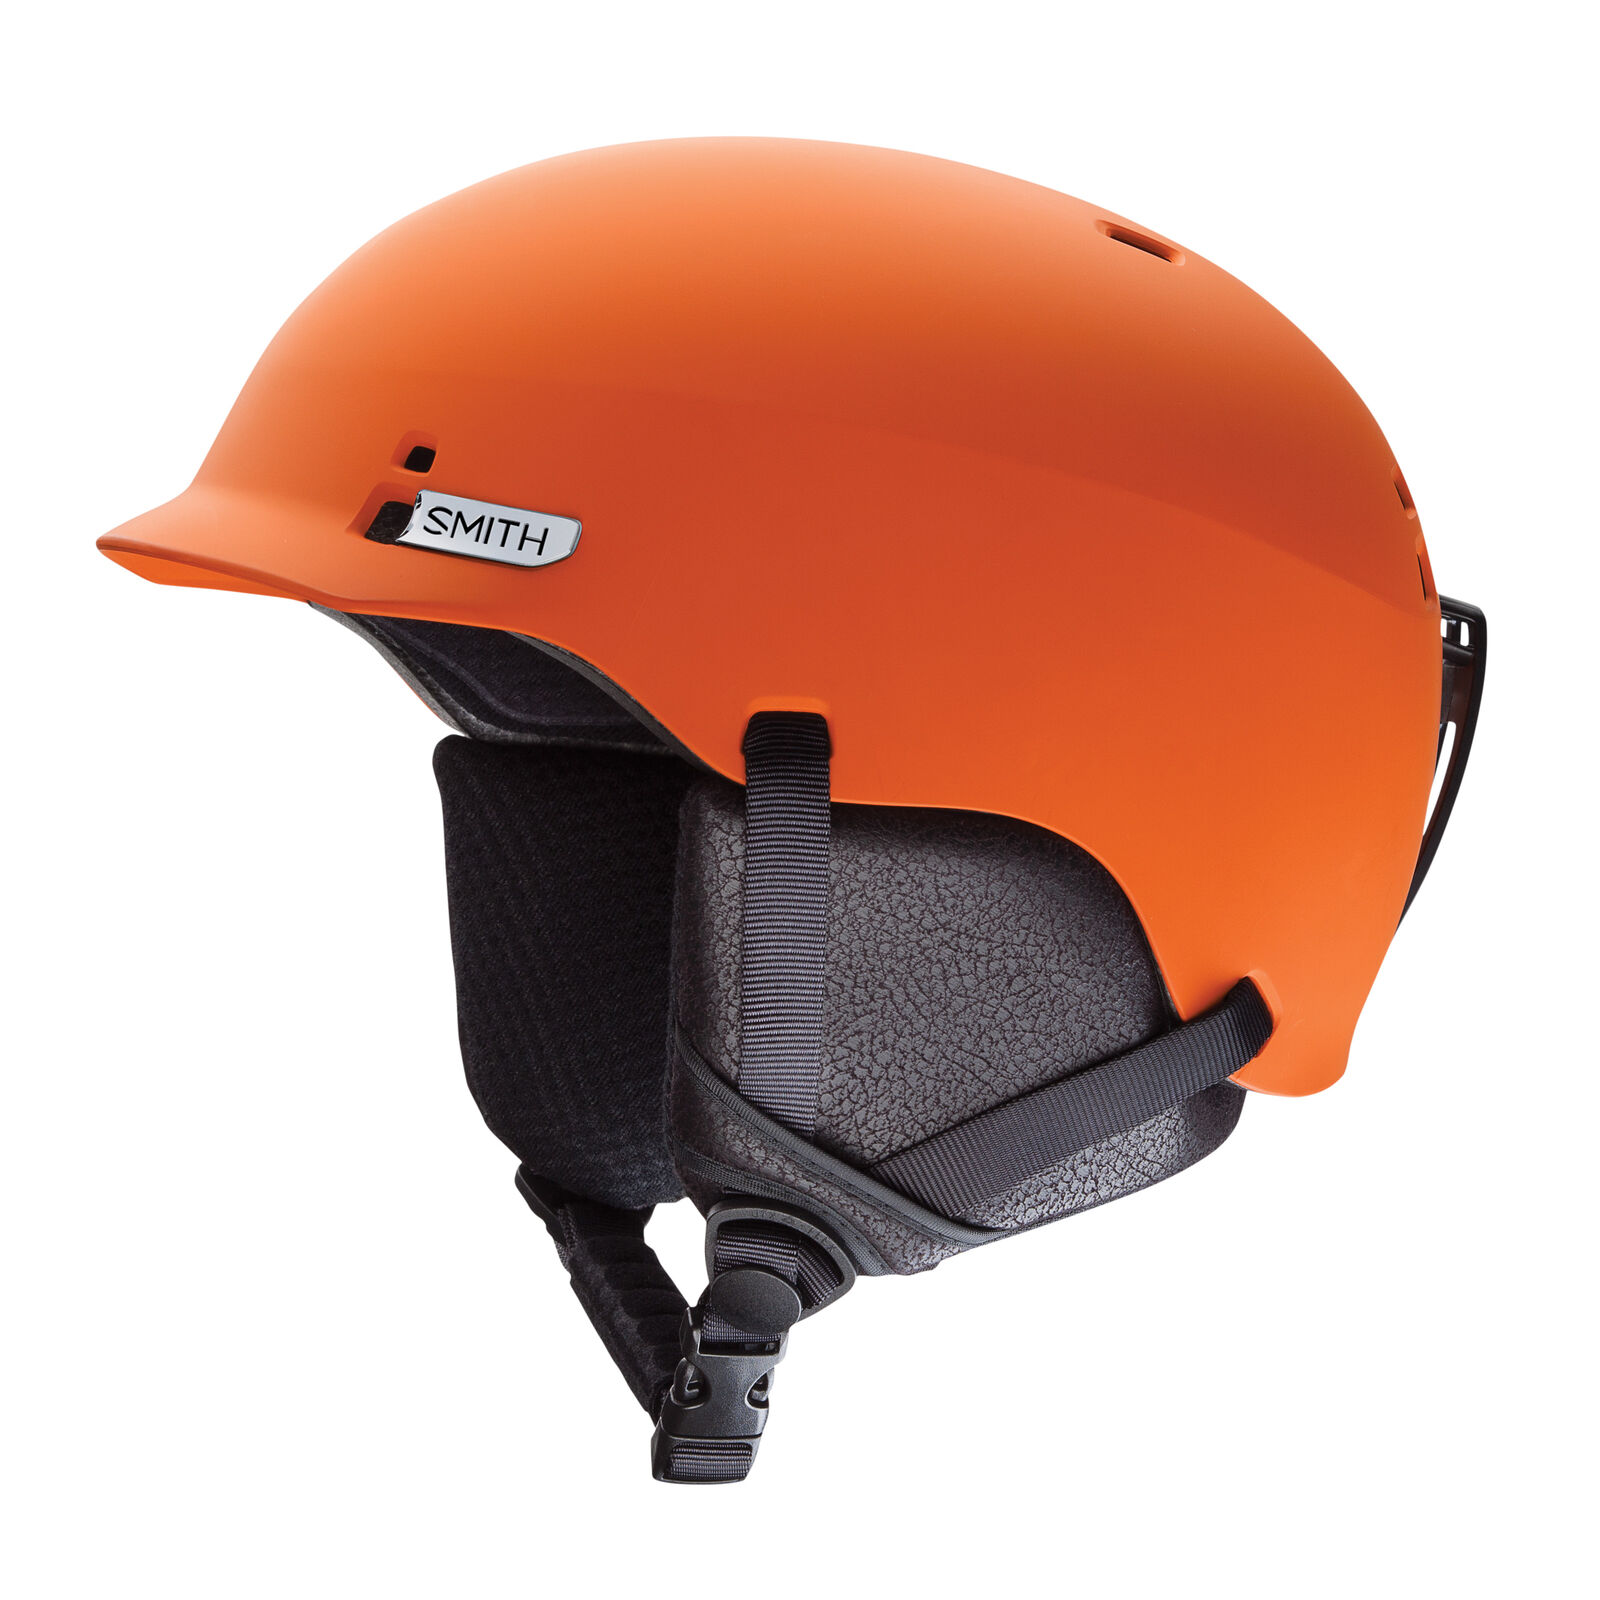 Smith Casco de Snowboard Esquí Gage orange colors Lisos Ajustable